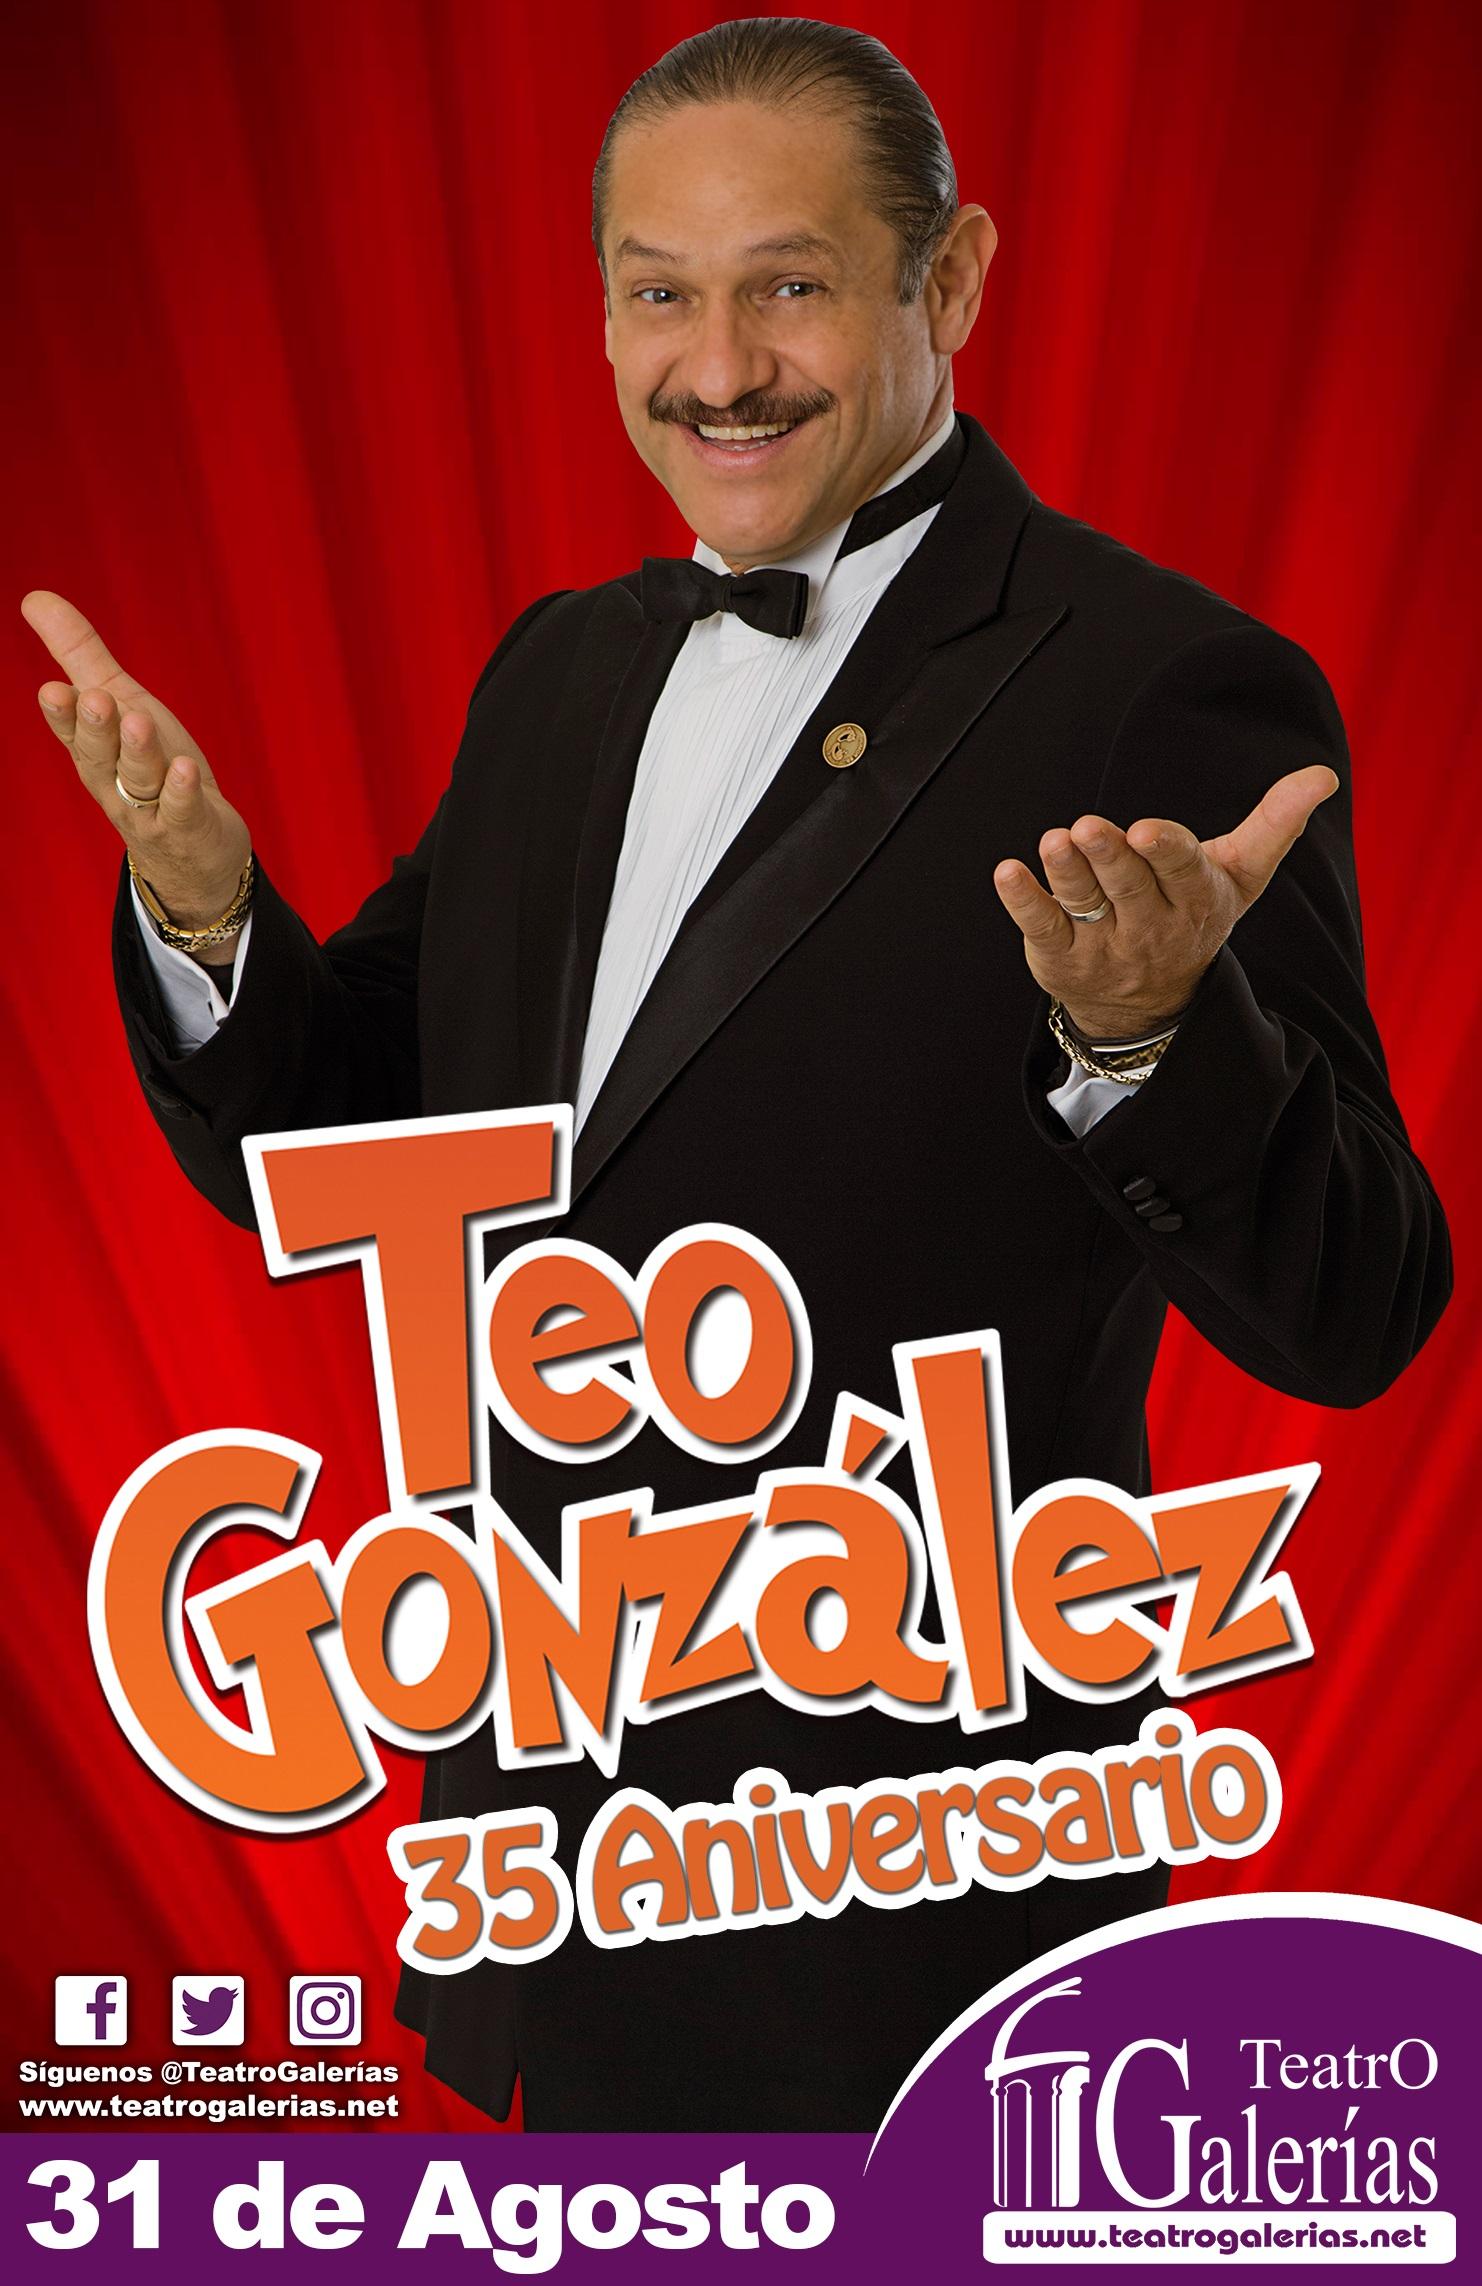 Teo González 35 Aniversario / Teatro Galerias